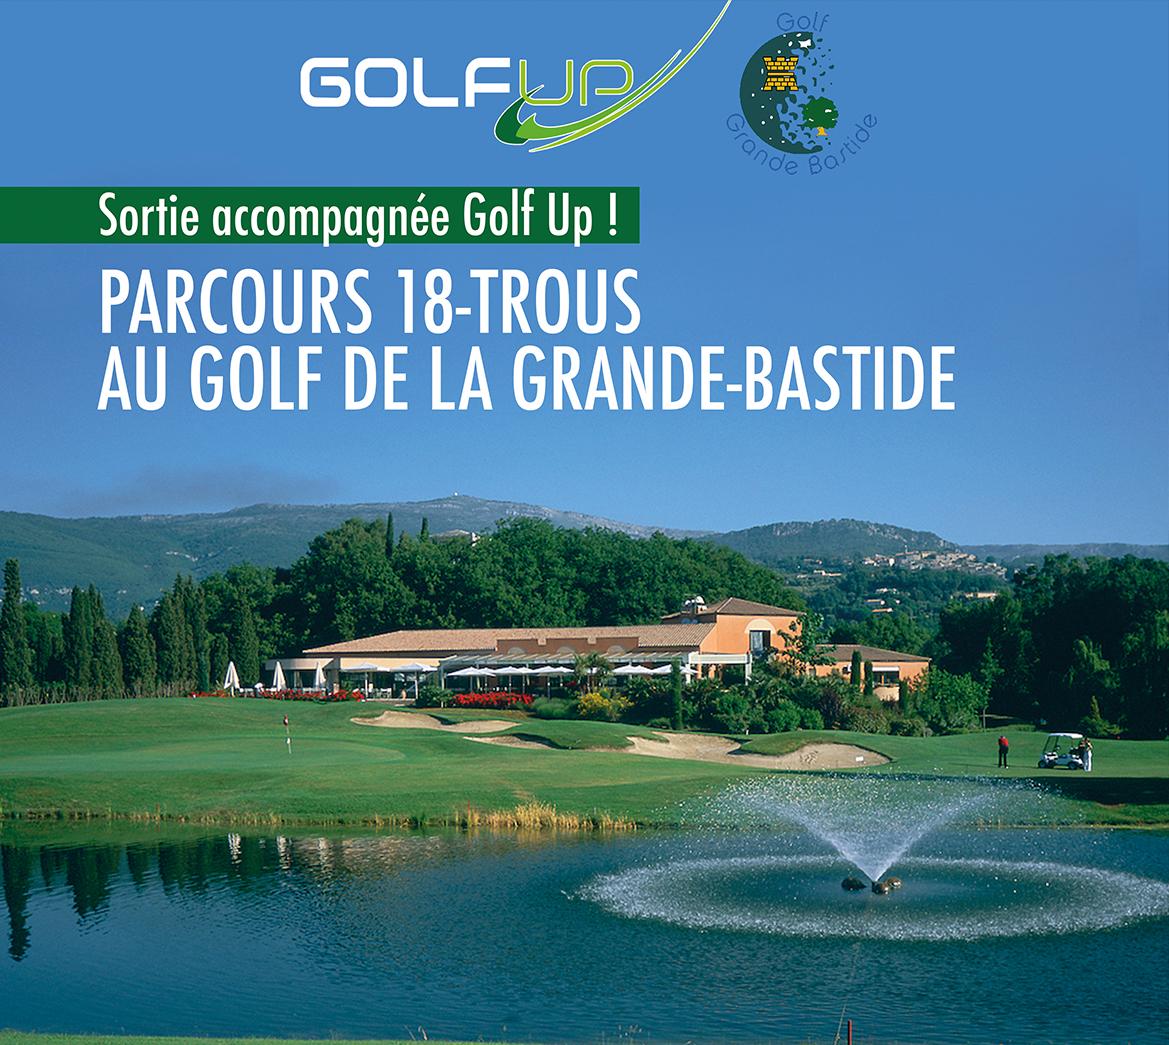 Sortie au golf de la Grande-Bastide, vendredi 27 mars